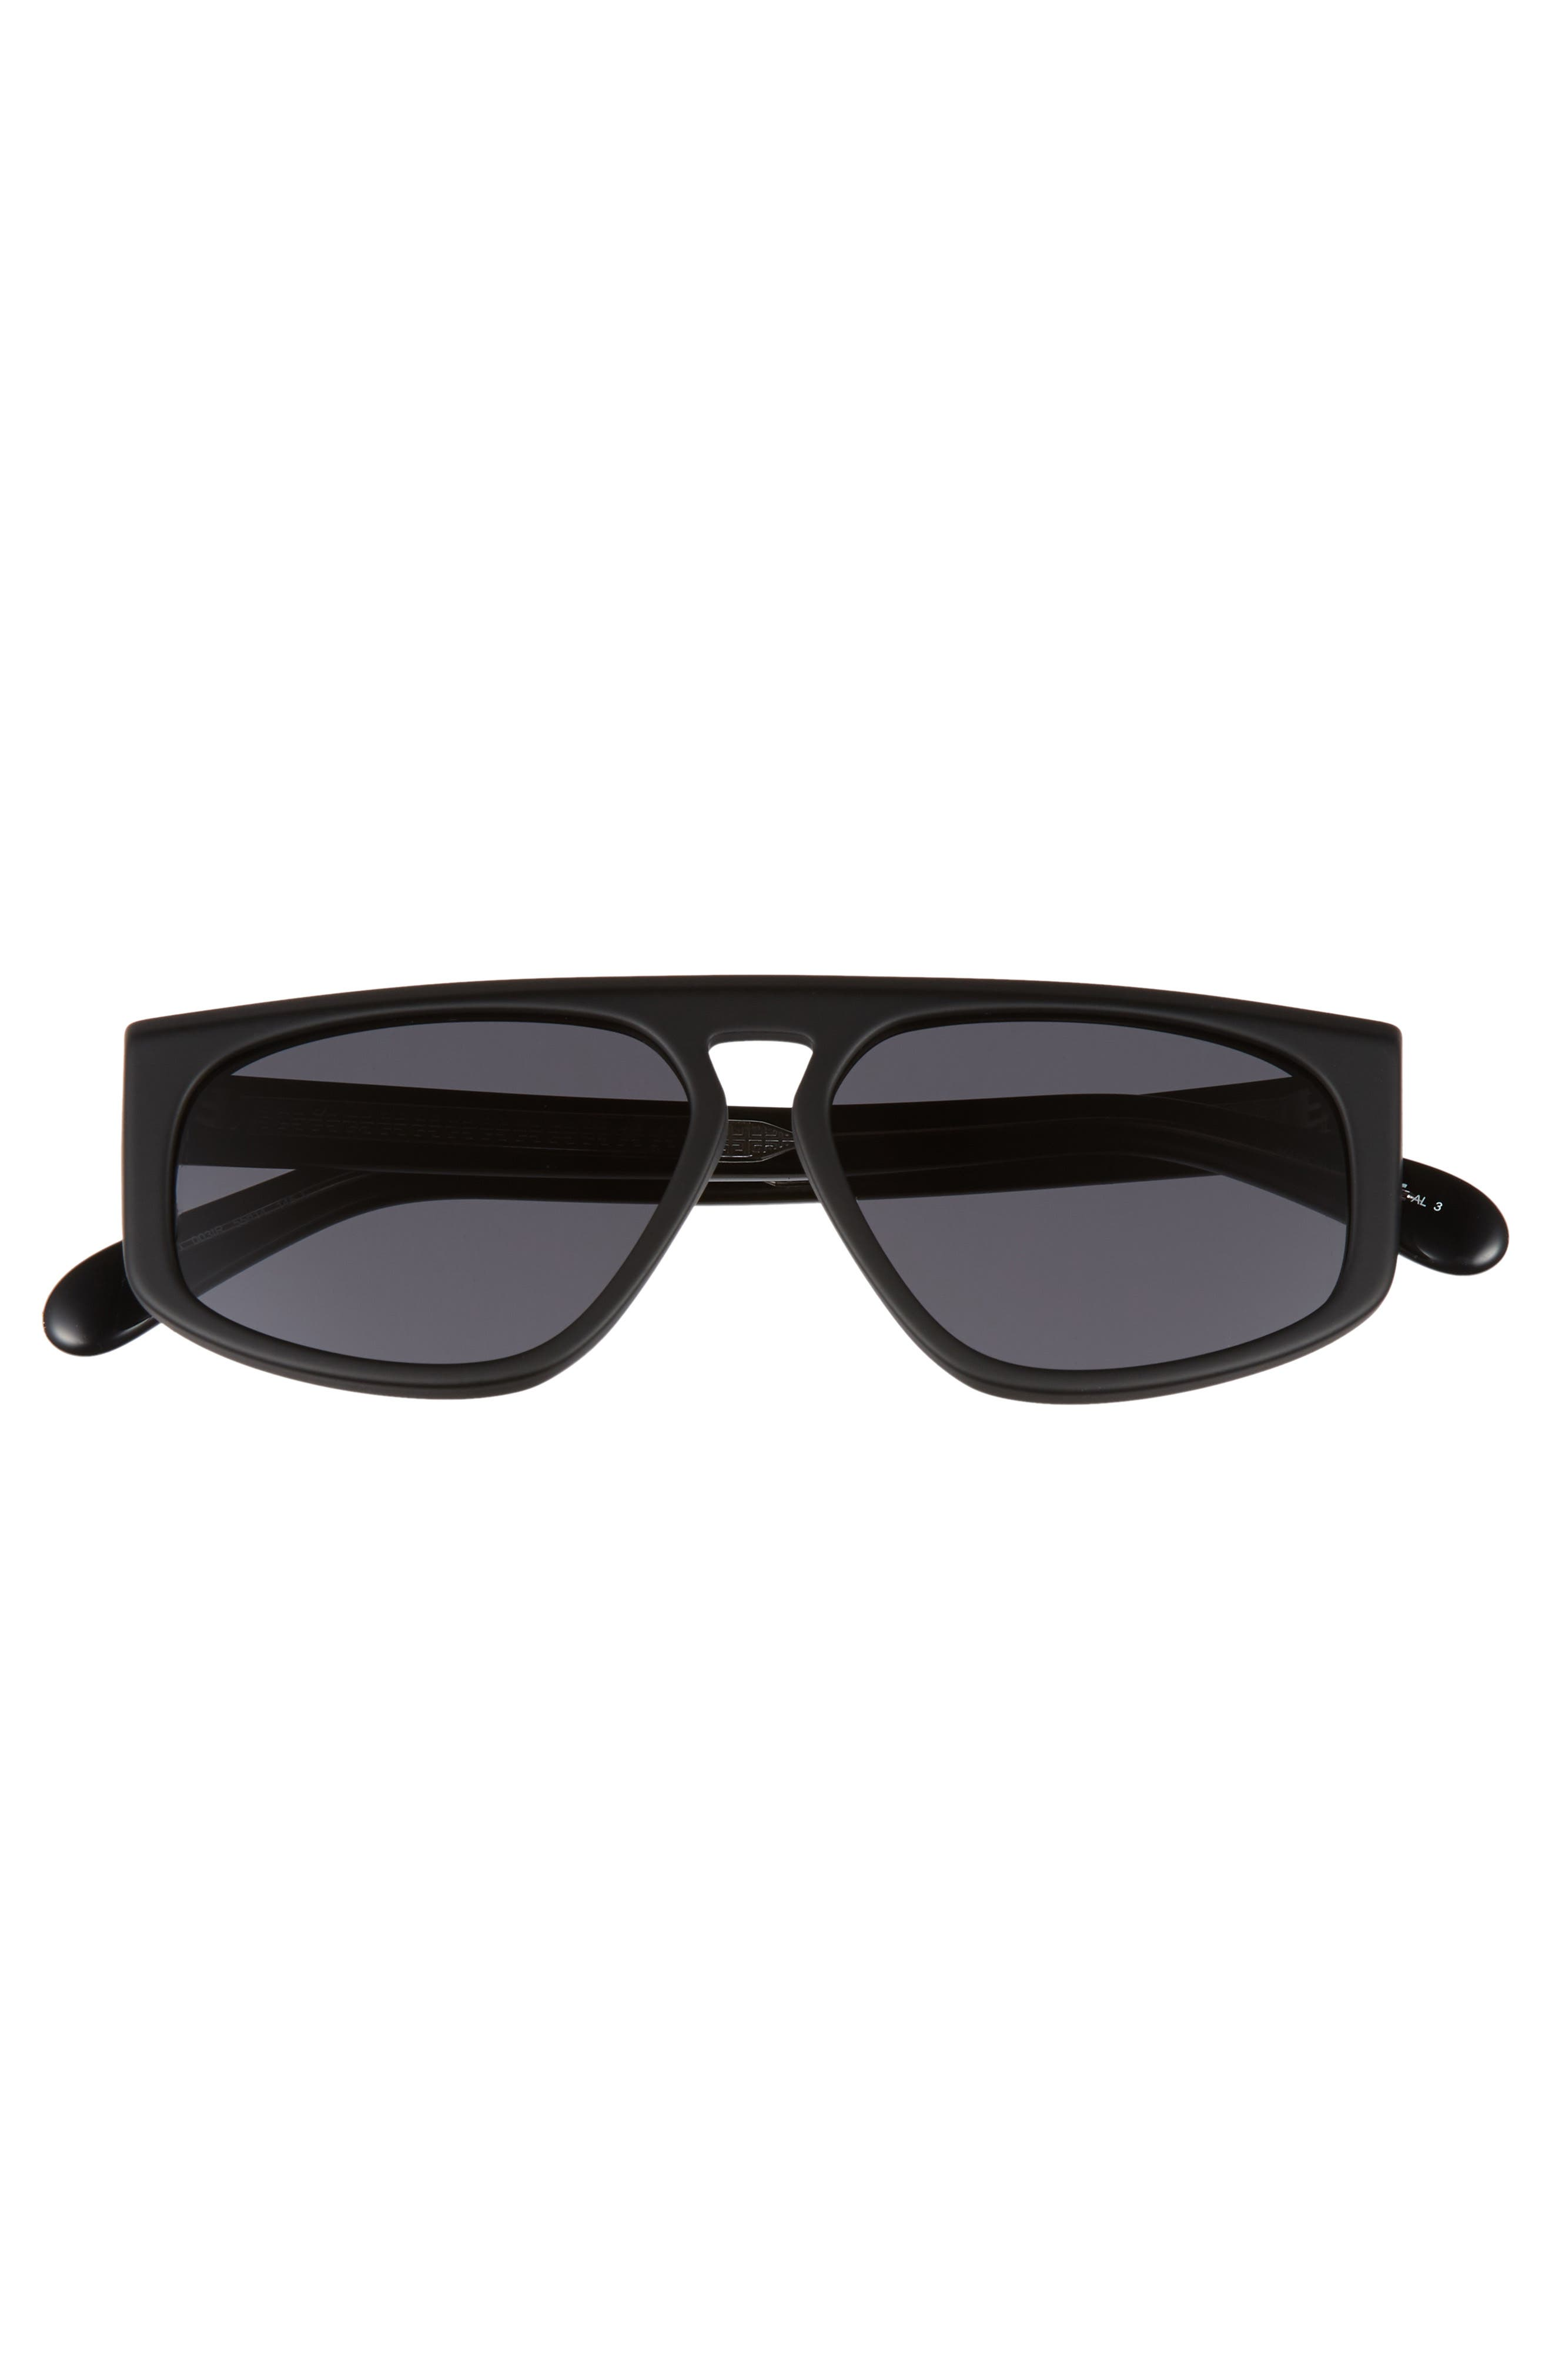 55mm Flat Top Sunglasses,                             Alternate thumbnail 3, color,                             MATTE BLACK